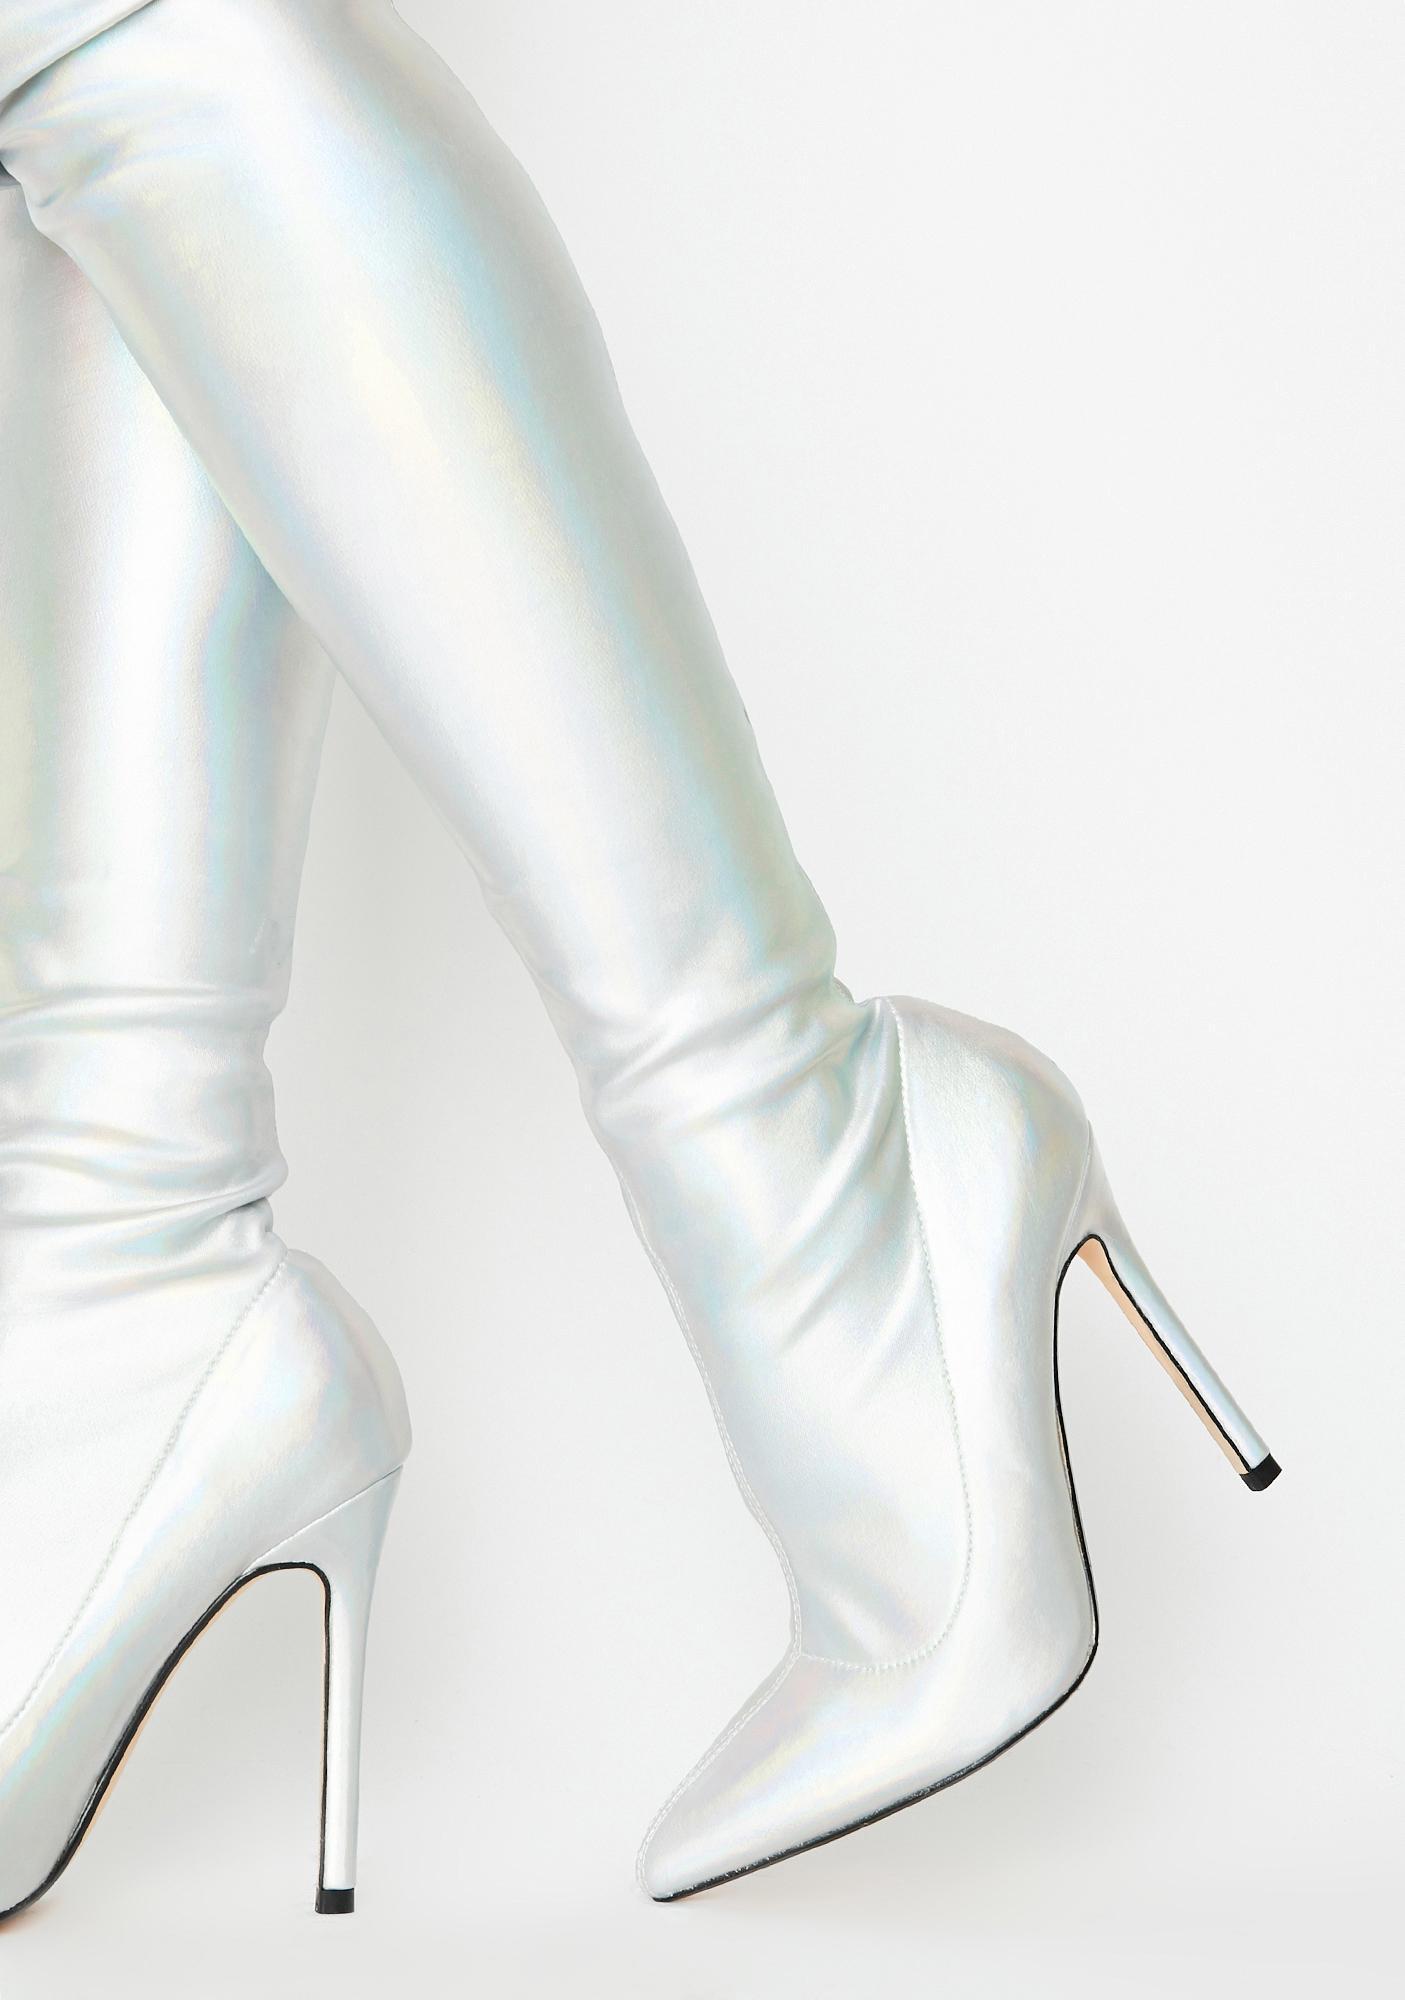 Lemon Drop by Privileged Bravvo Thigh High Boots